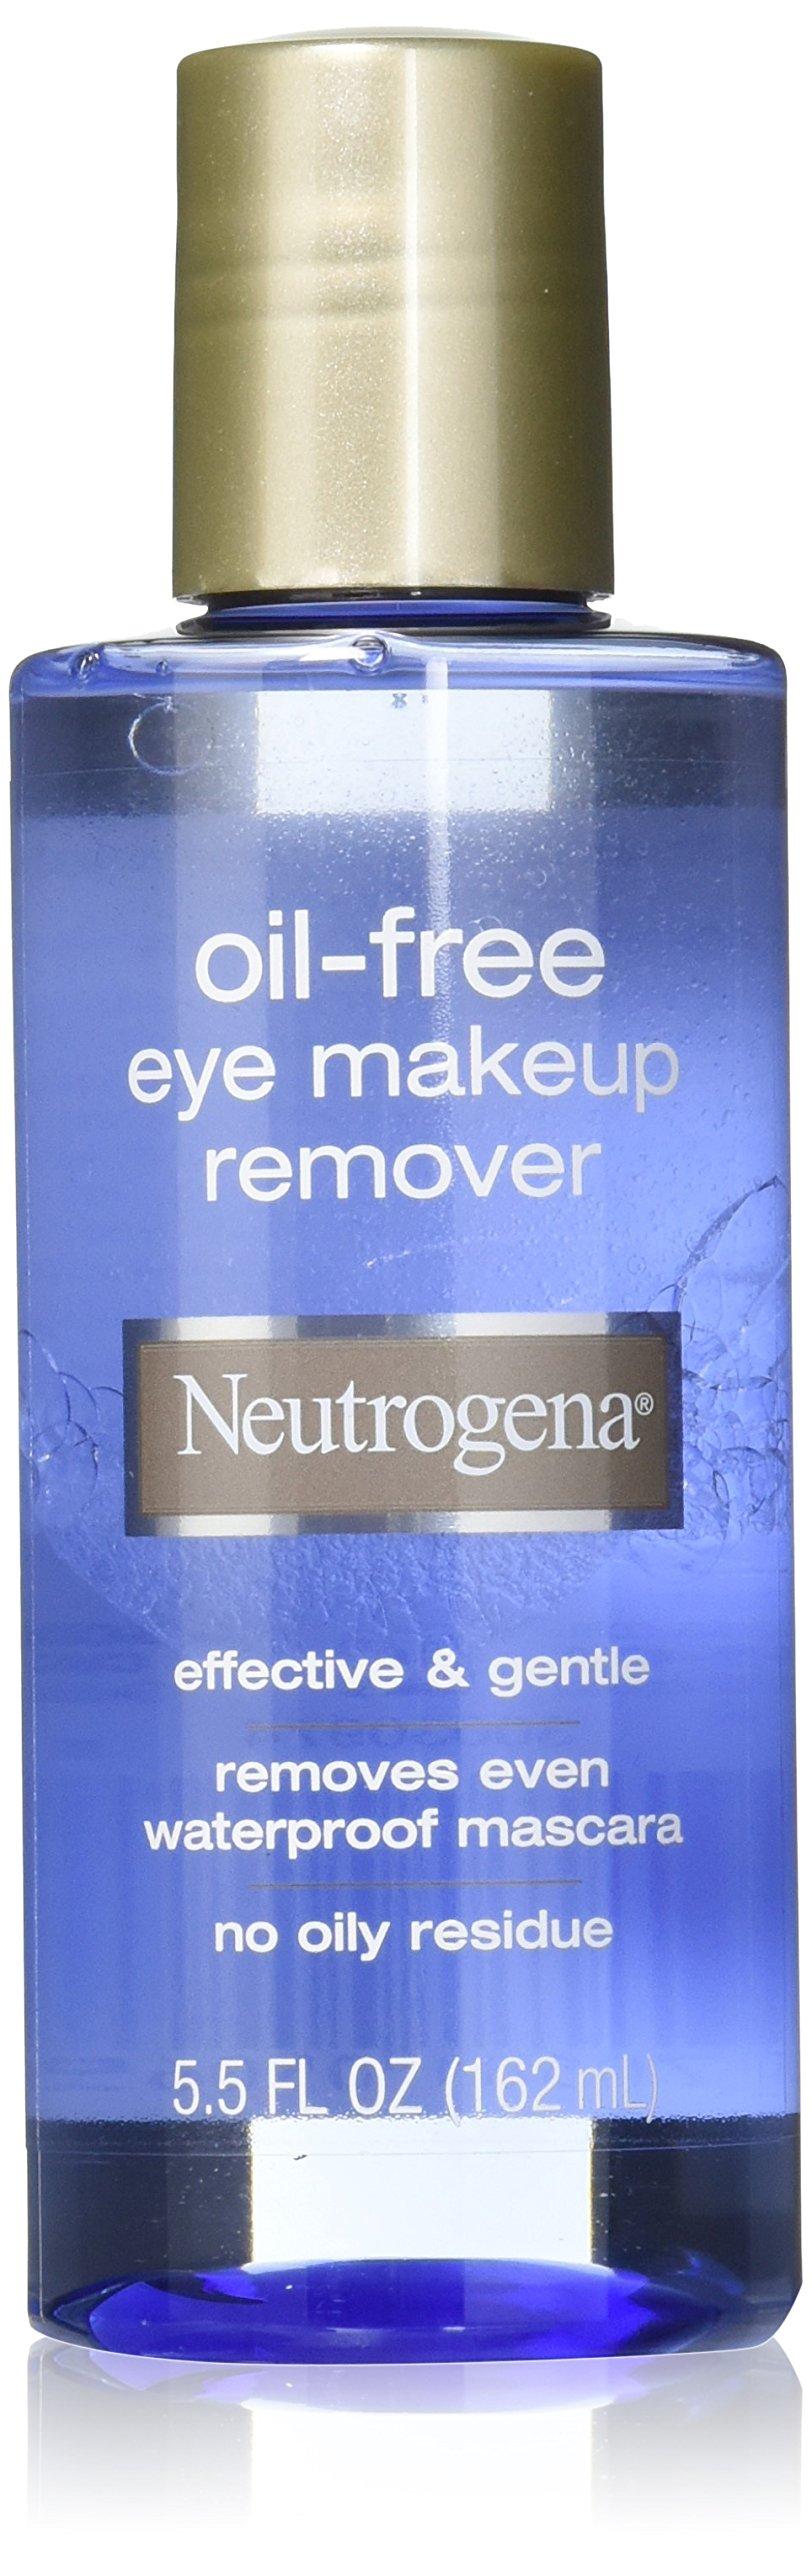 Neutrogena Oil, Free Eye Makeup Remover - 5.5 oz - 2 Pack